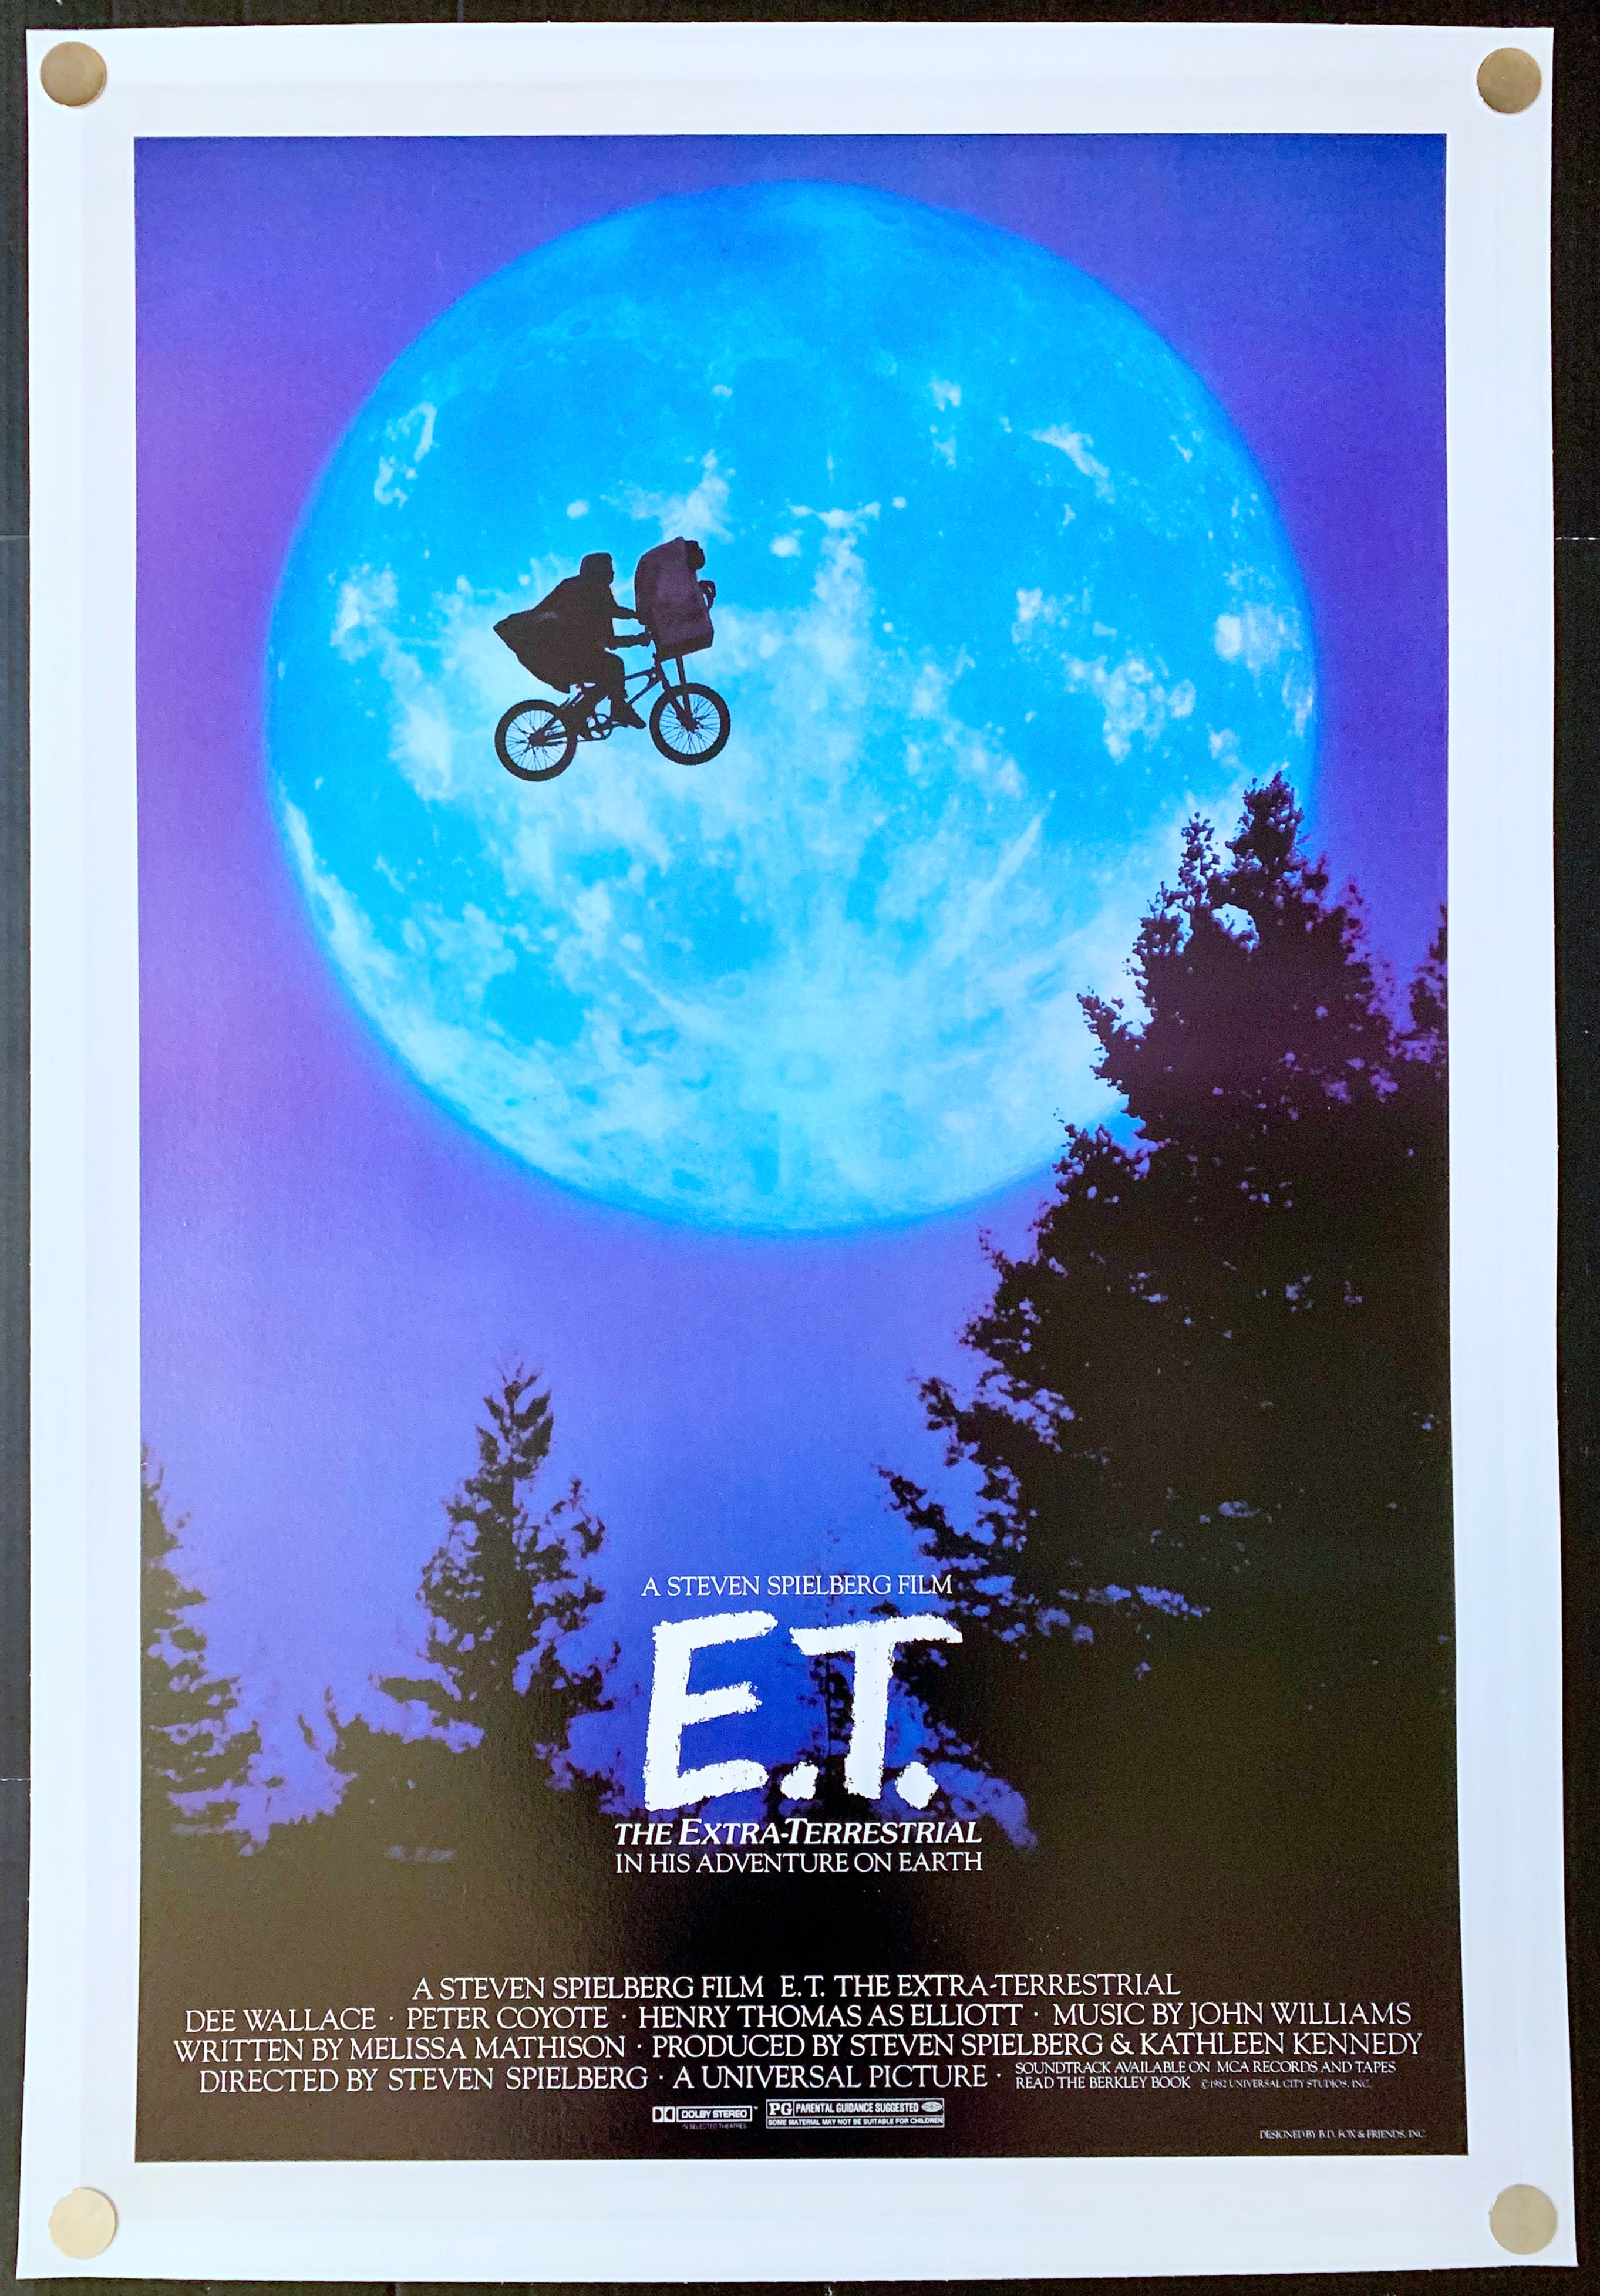 E T The Extra Terrestrial 1982 Vintage Film Art